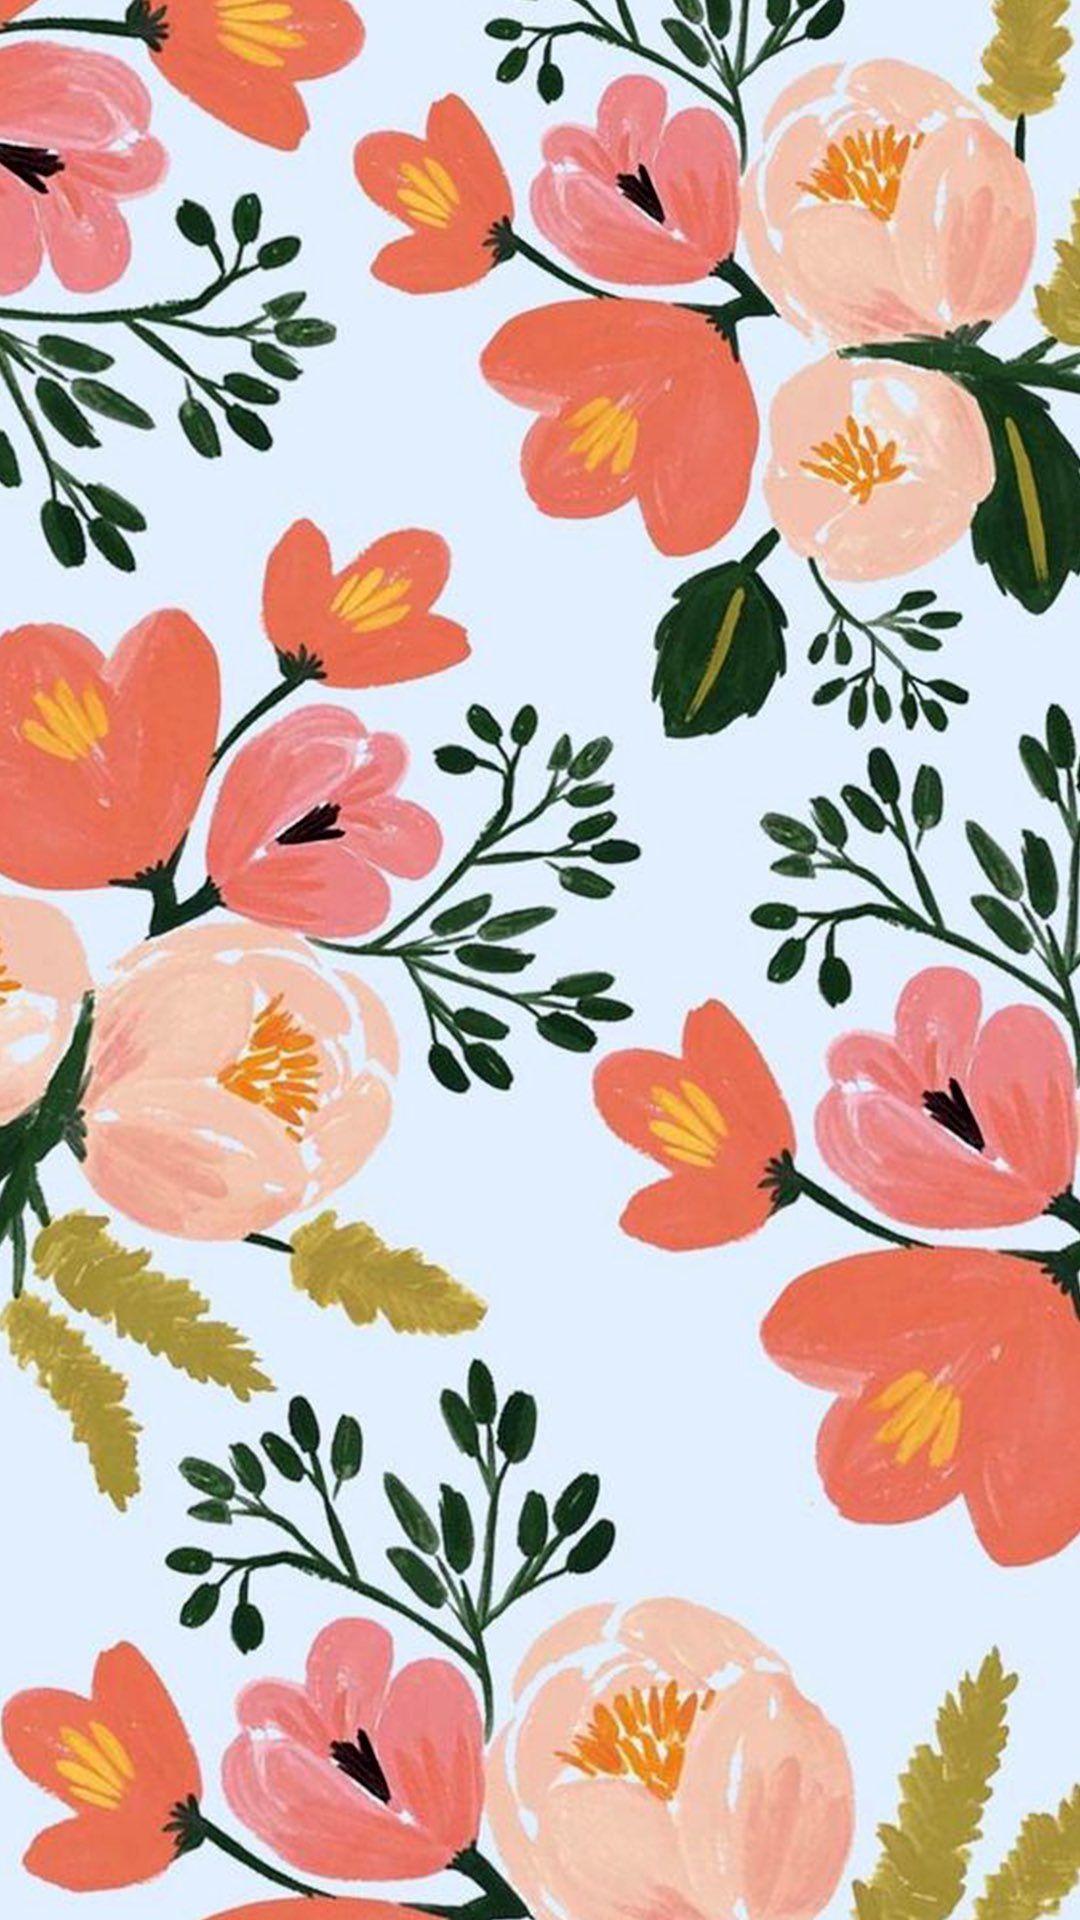 Floral Wallpaper Floral Wallpaper Iphone Tumblr Iphone